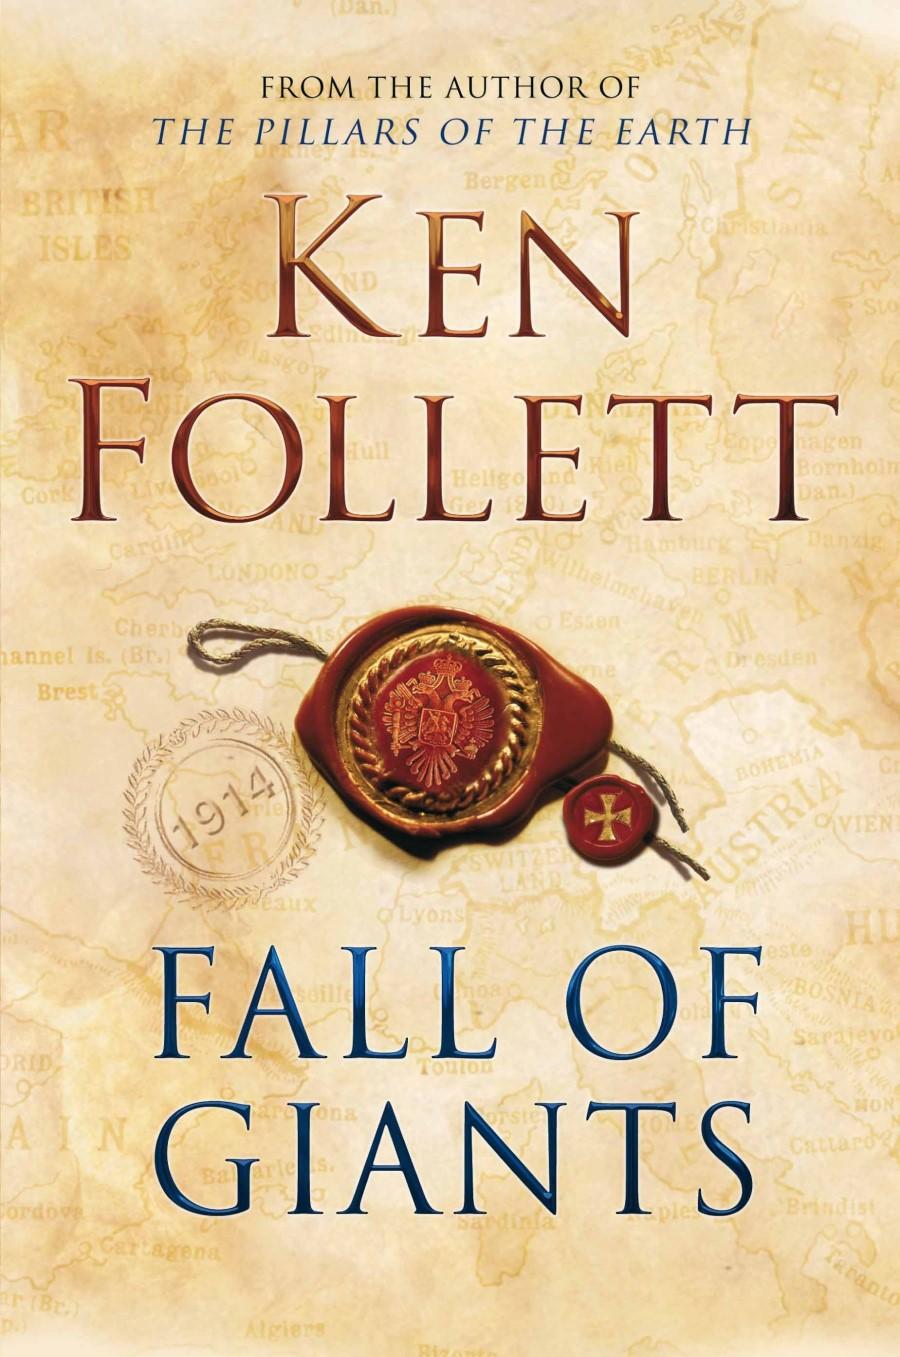 KEN FOLLETT, author of Fall of Giants, answers Ten